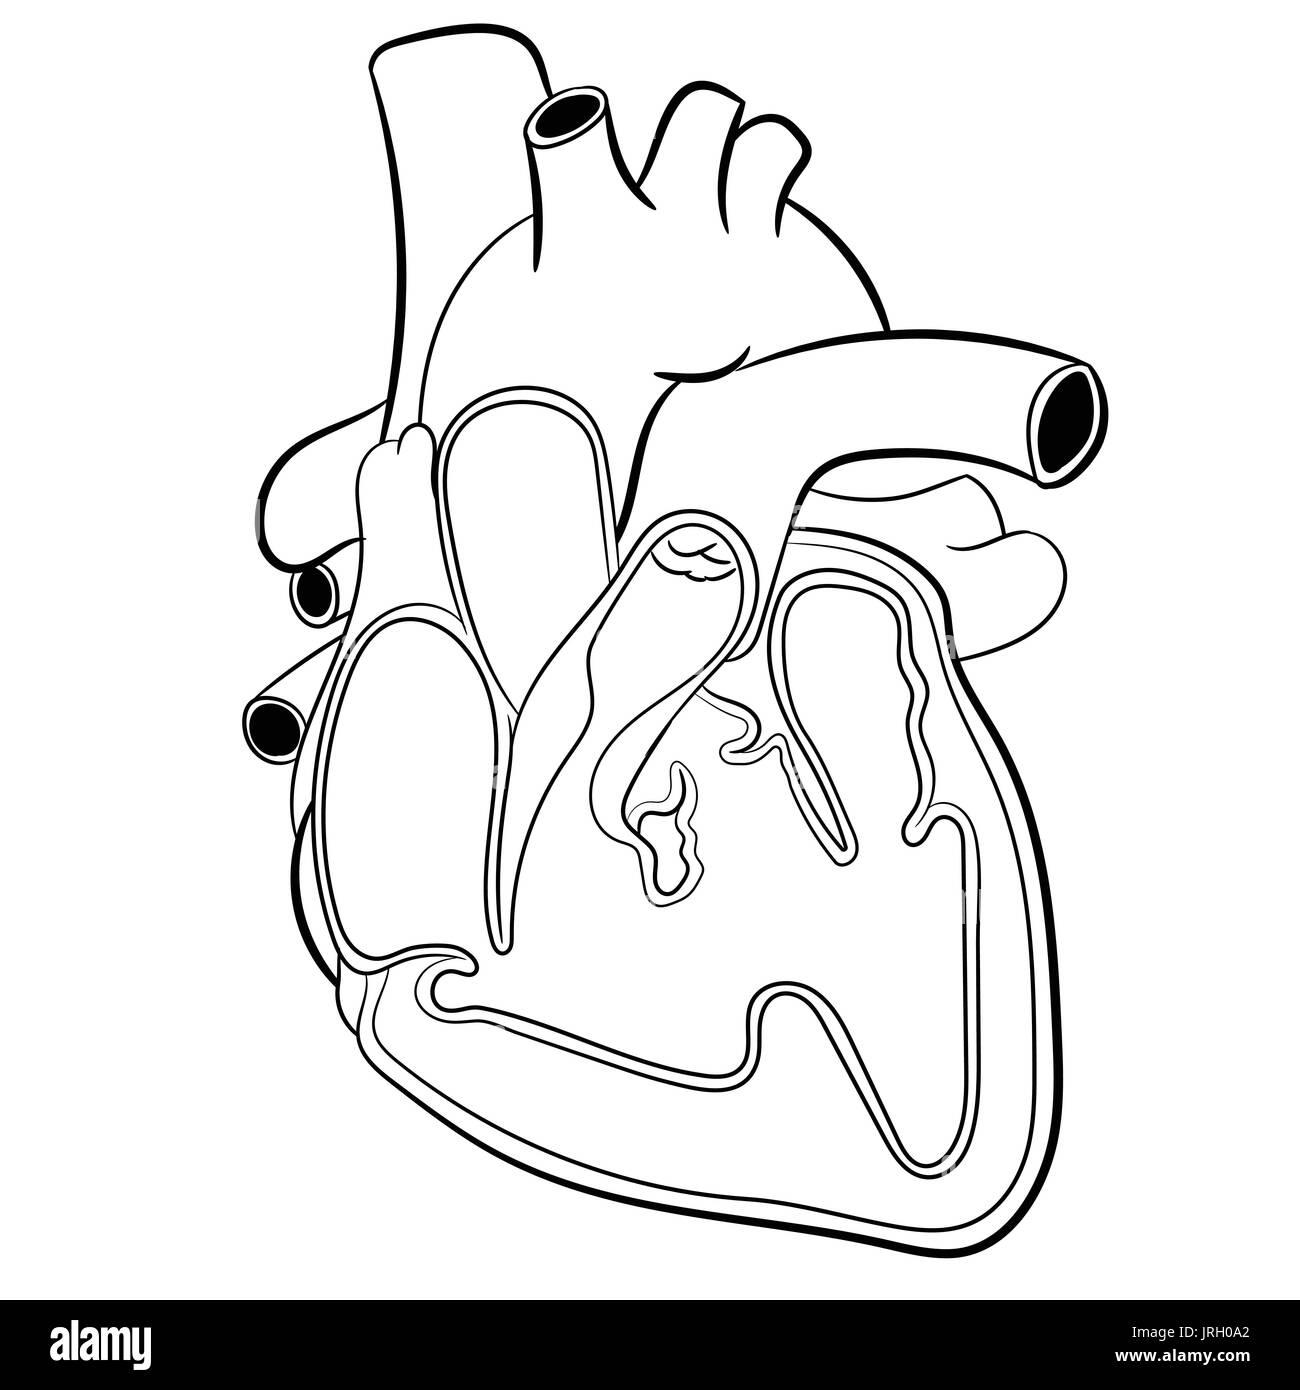 Cardiac Vein Stock Photos & Cardiac Vein Stock Images - Alamy